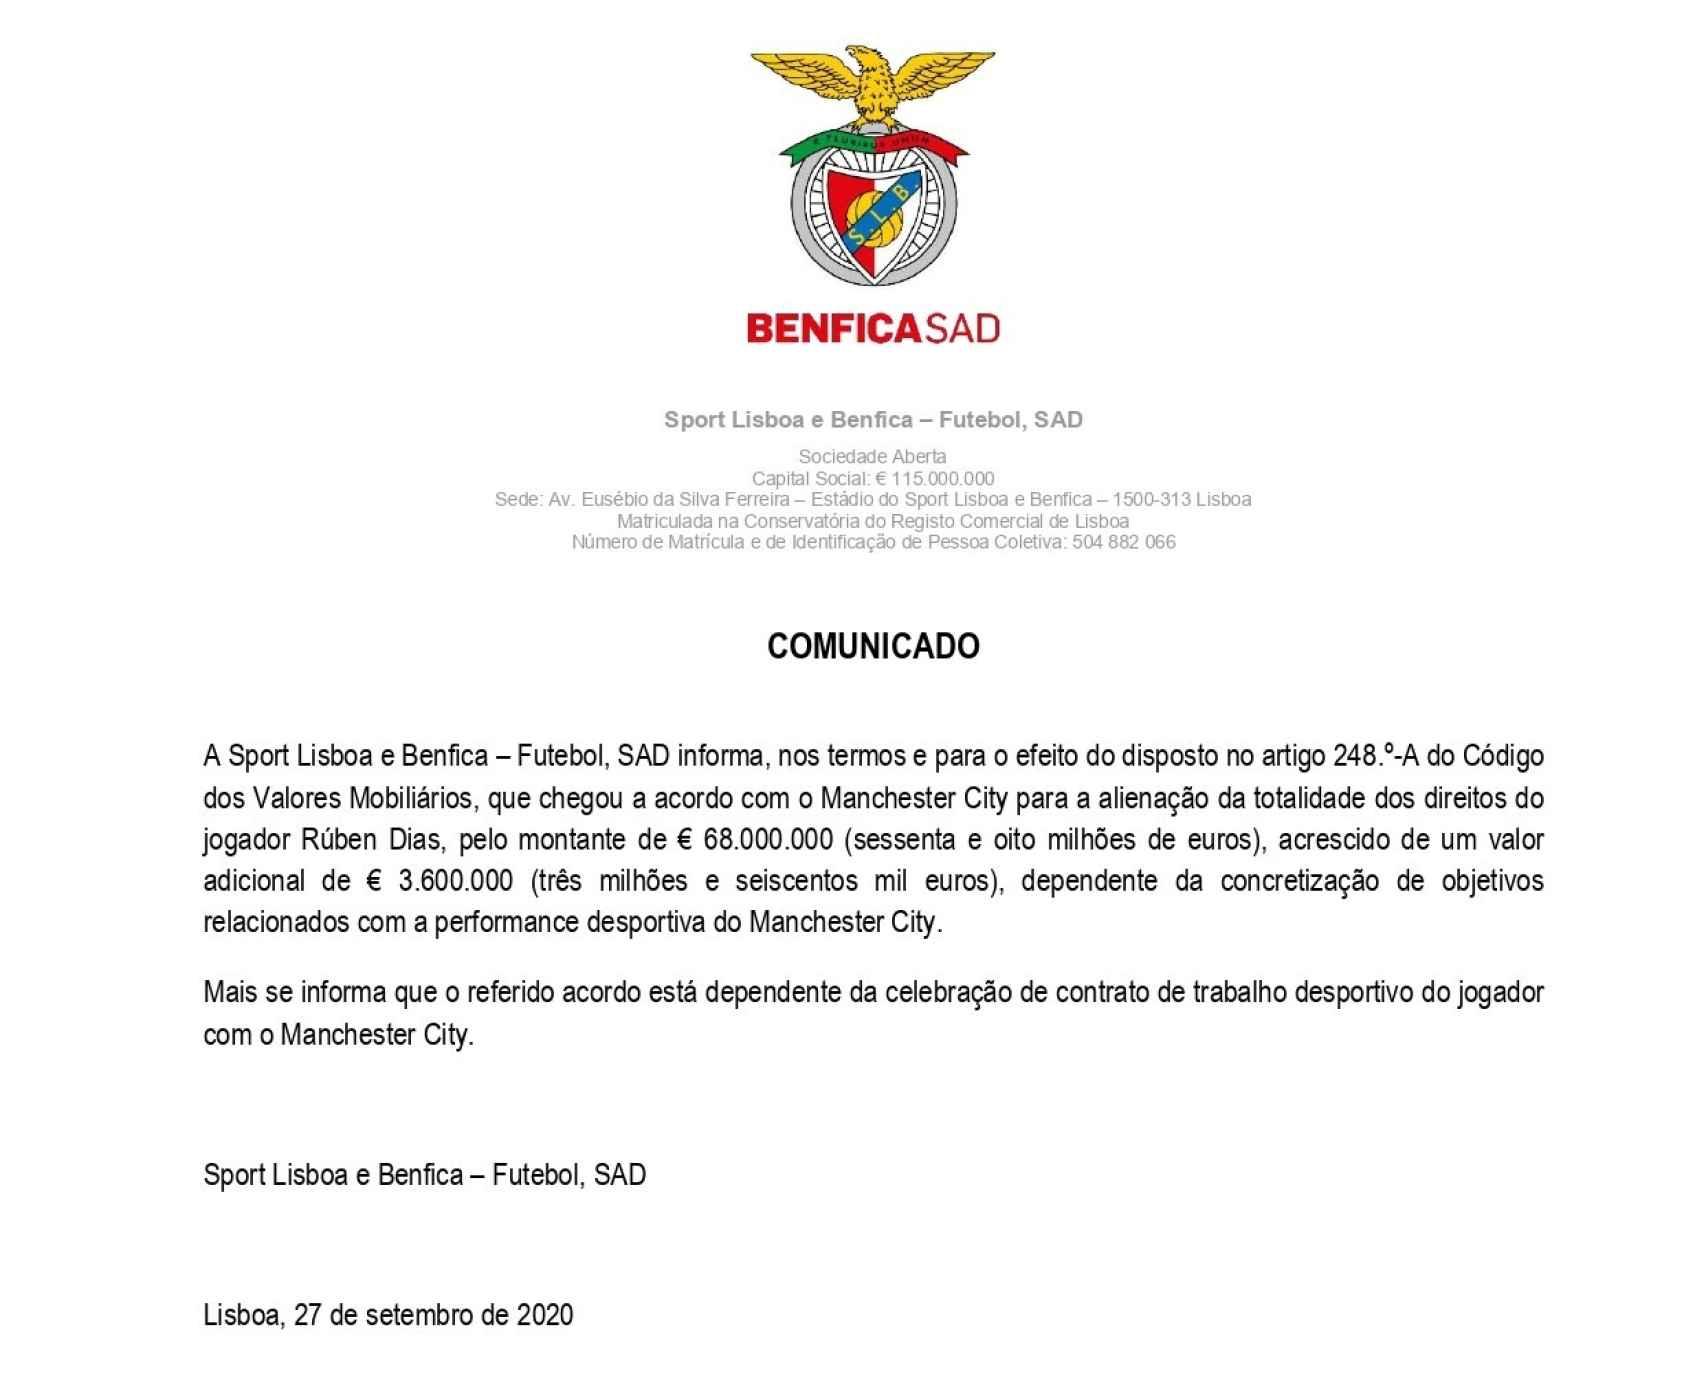 La nota del Benfica a la CMVM de Portugal anunciando la salida de Rubén Dias